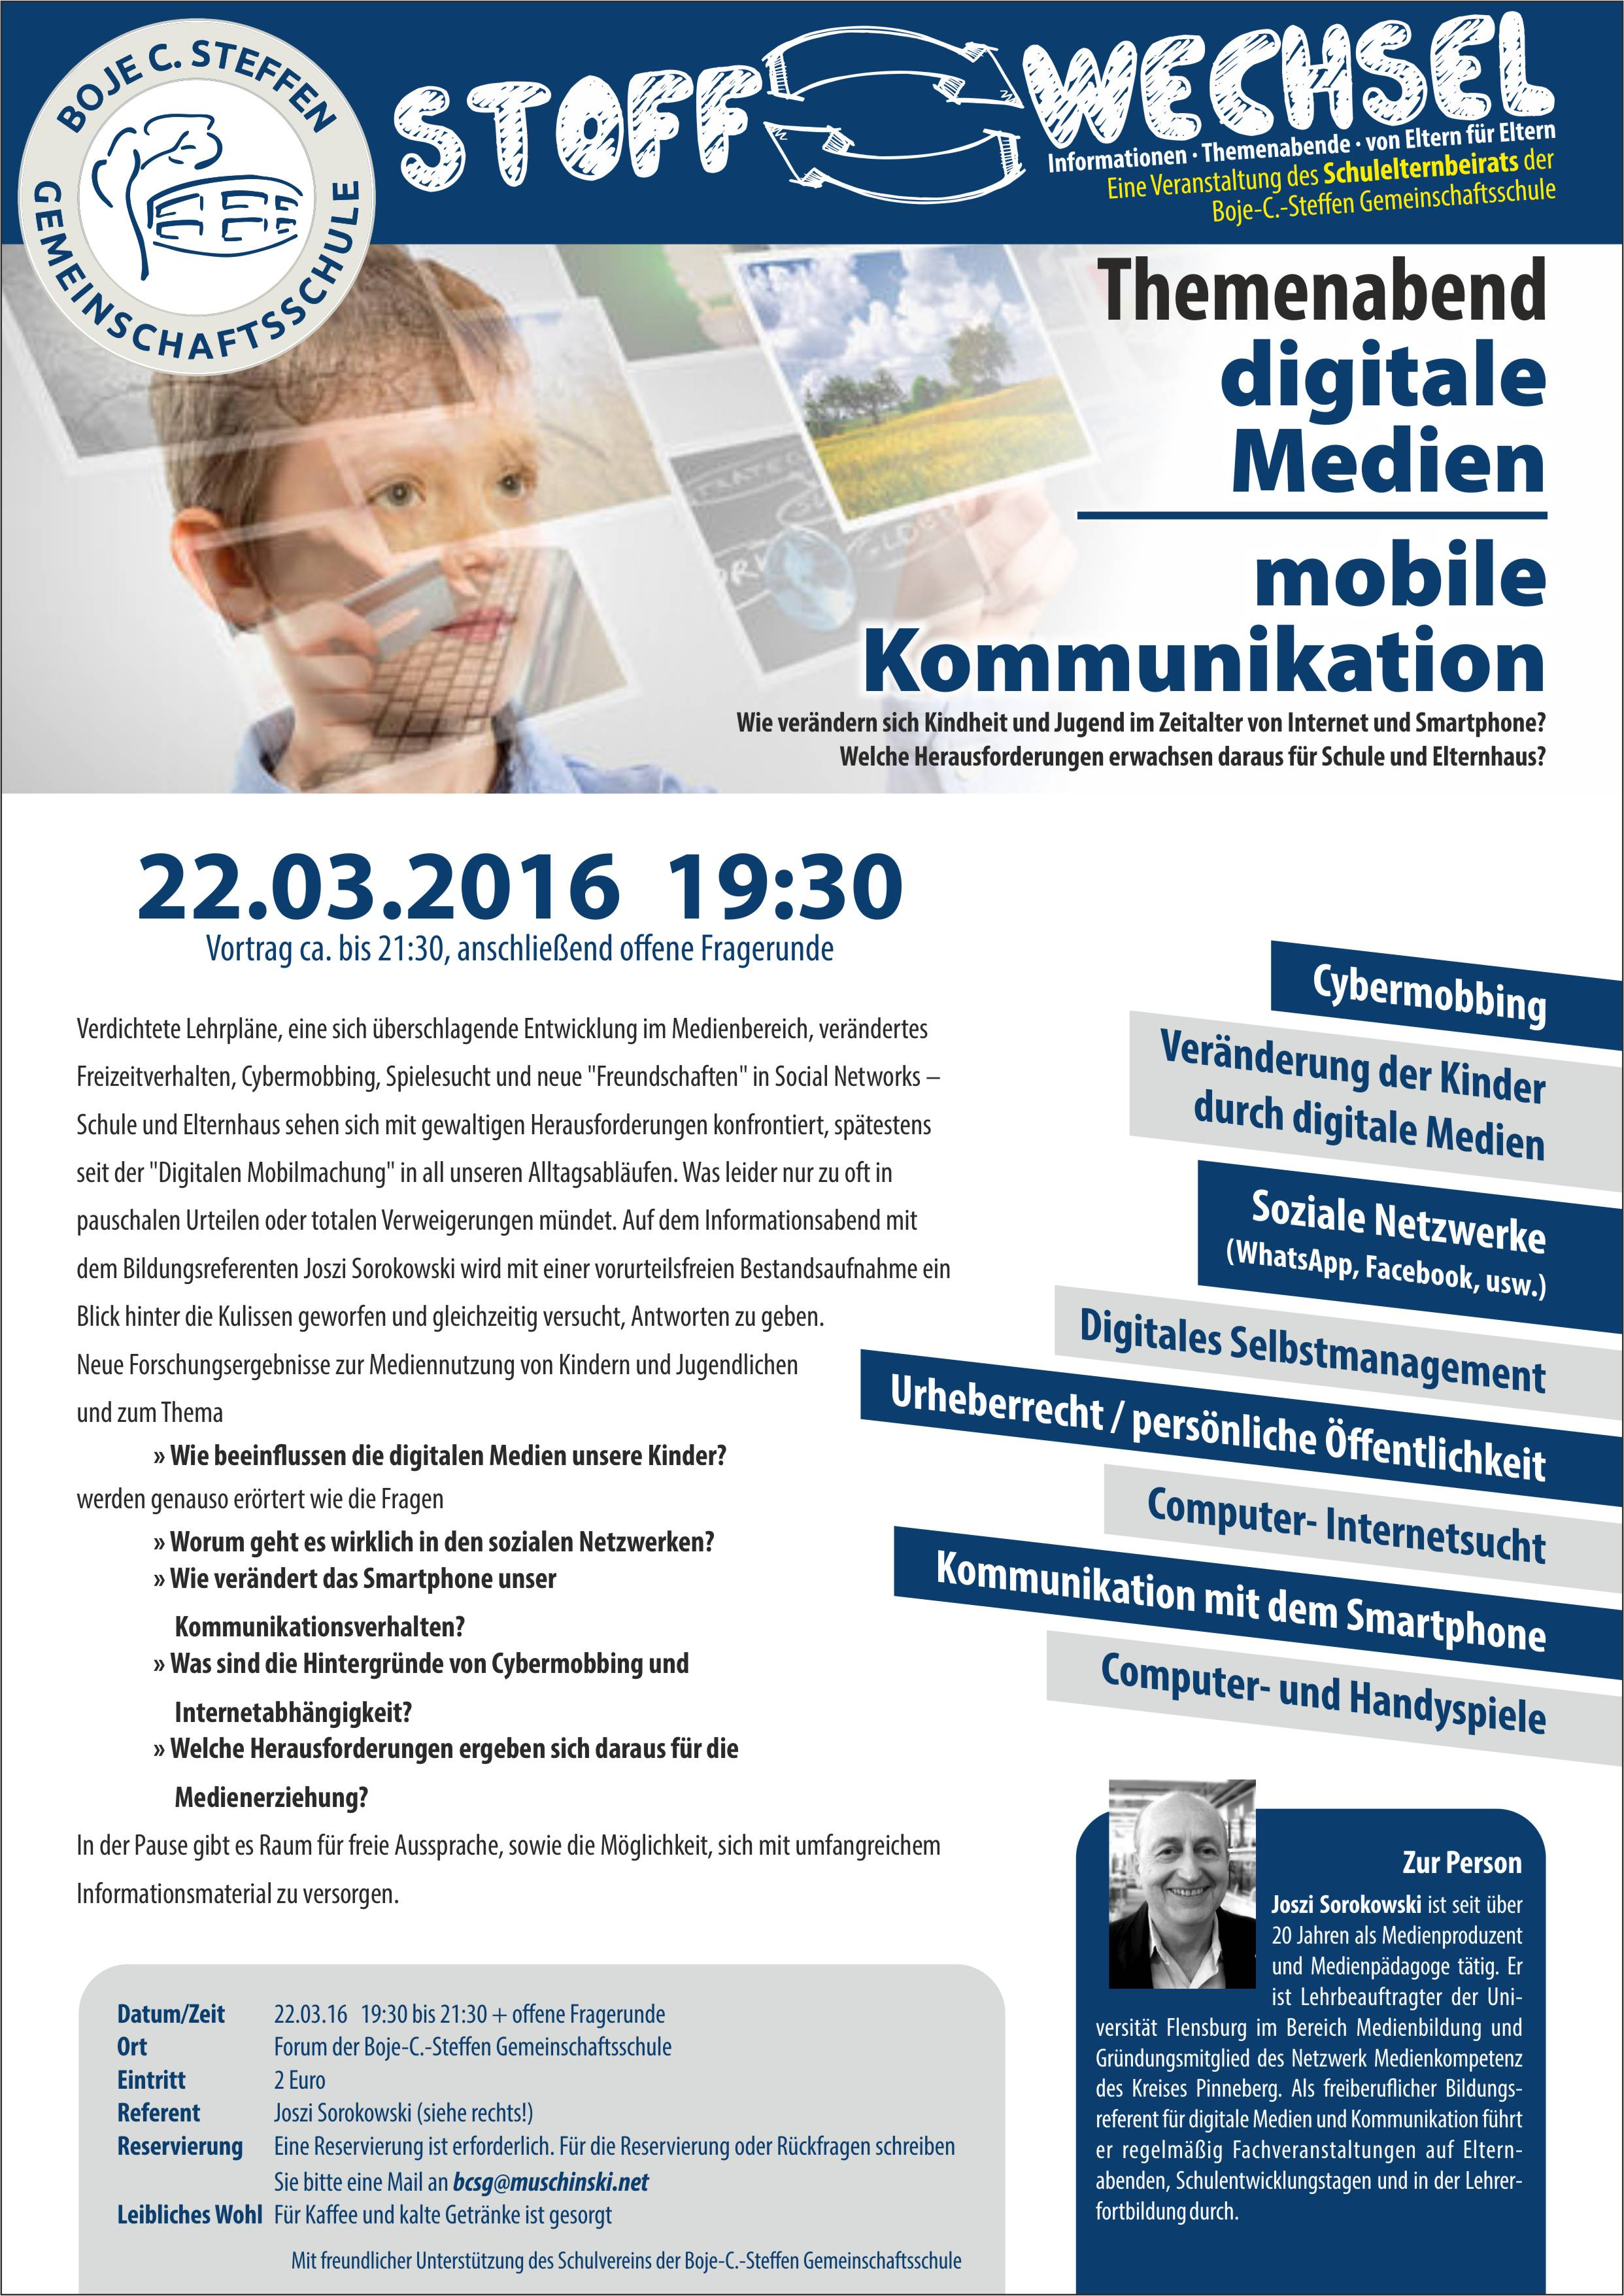 15-16-stoffwechsel-themenabend-digitale-medien-01